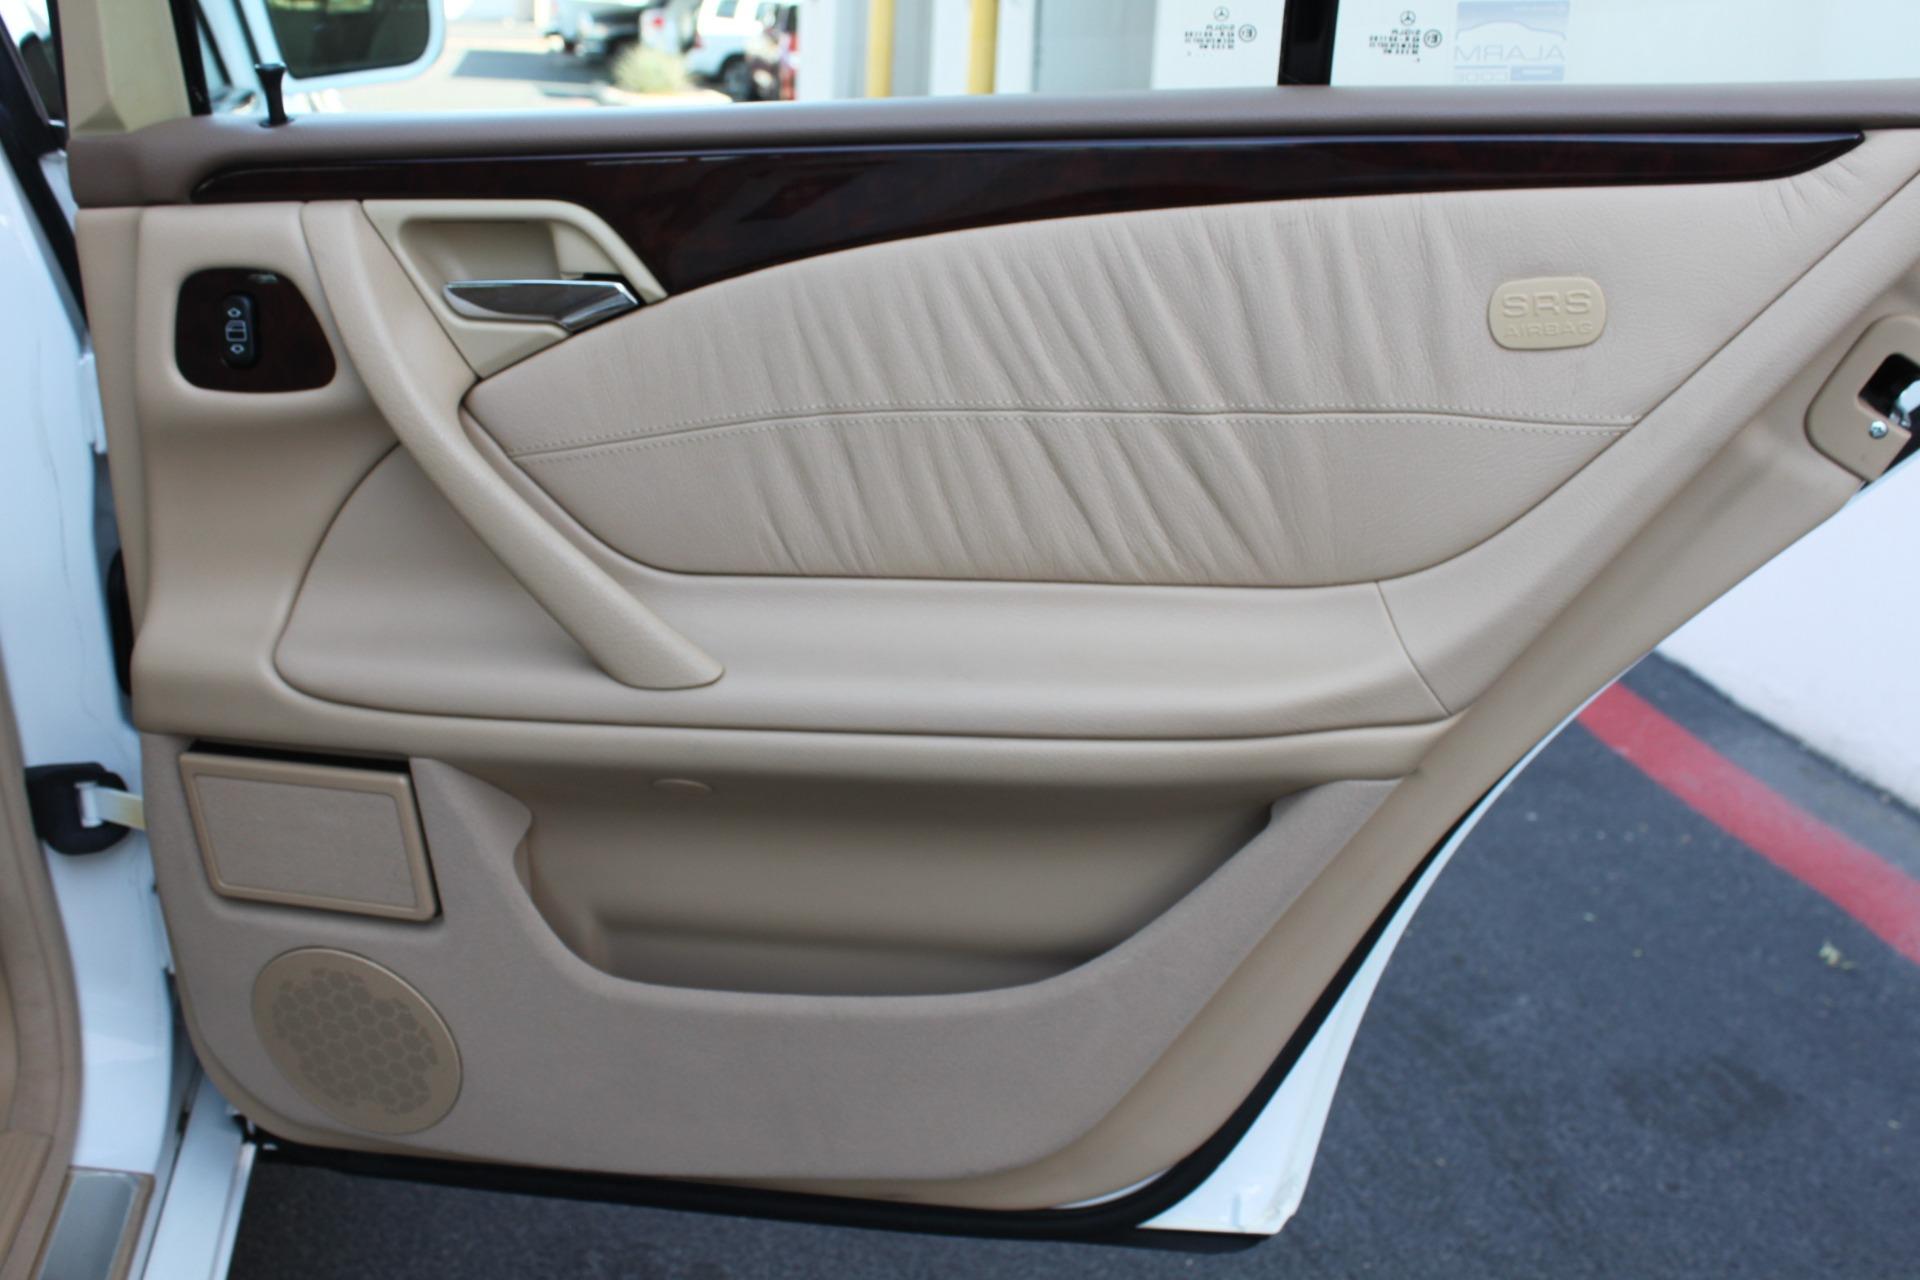 Used-2000-Mercedes-Benz-E-Class-Lexus